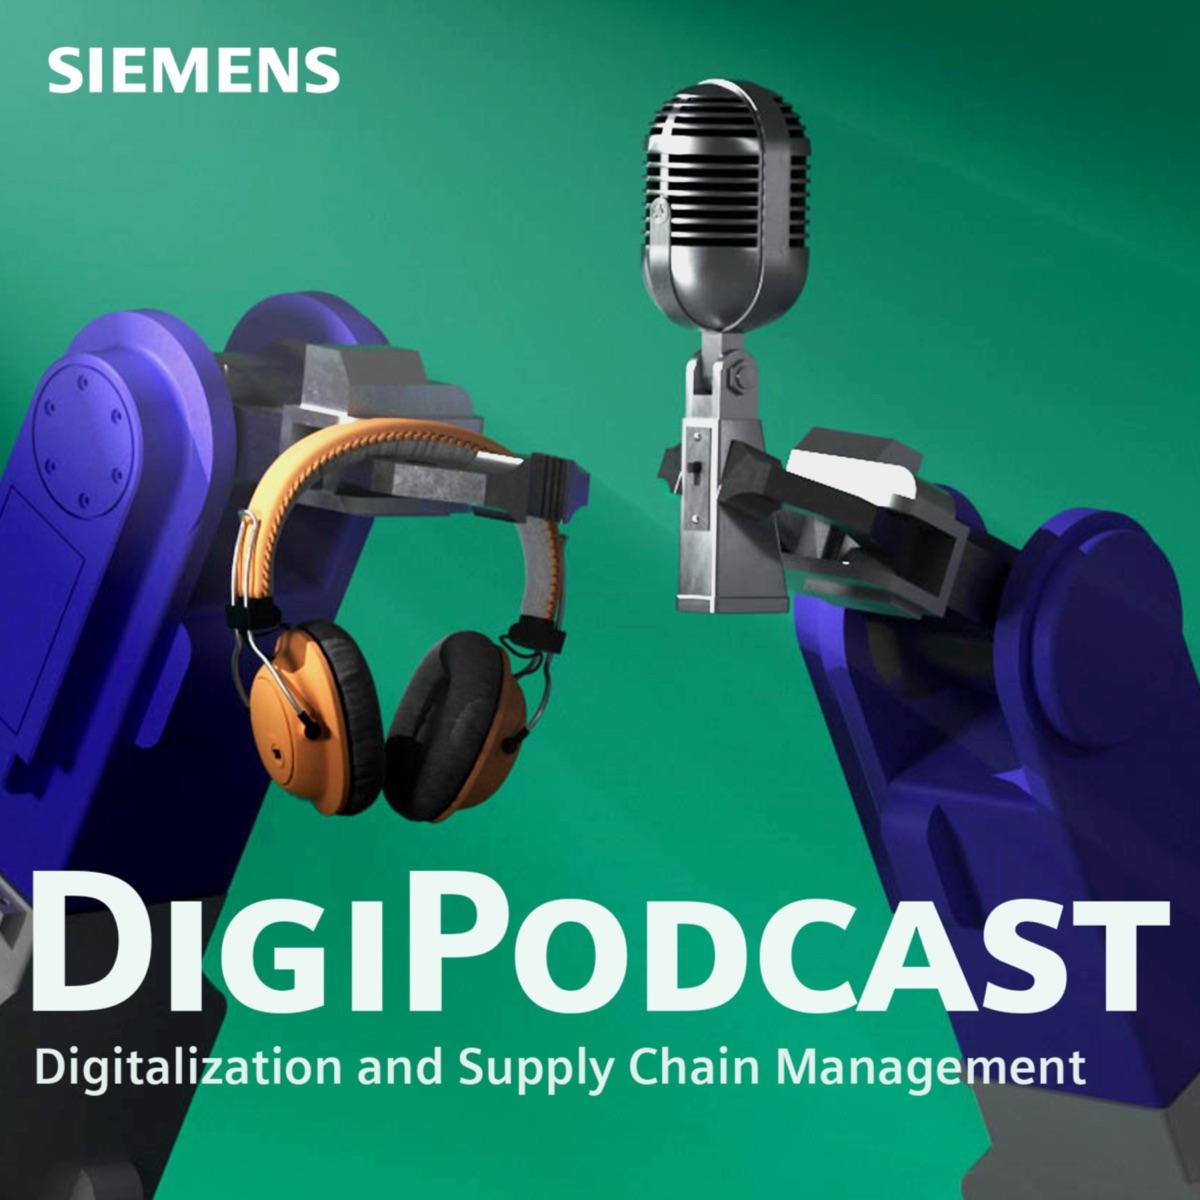 DigiPodcast